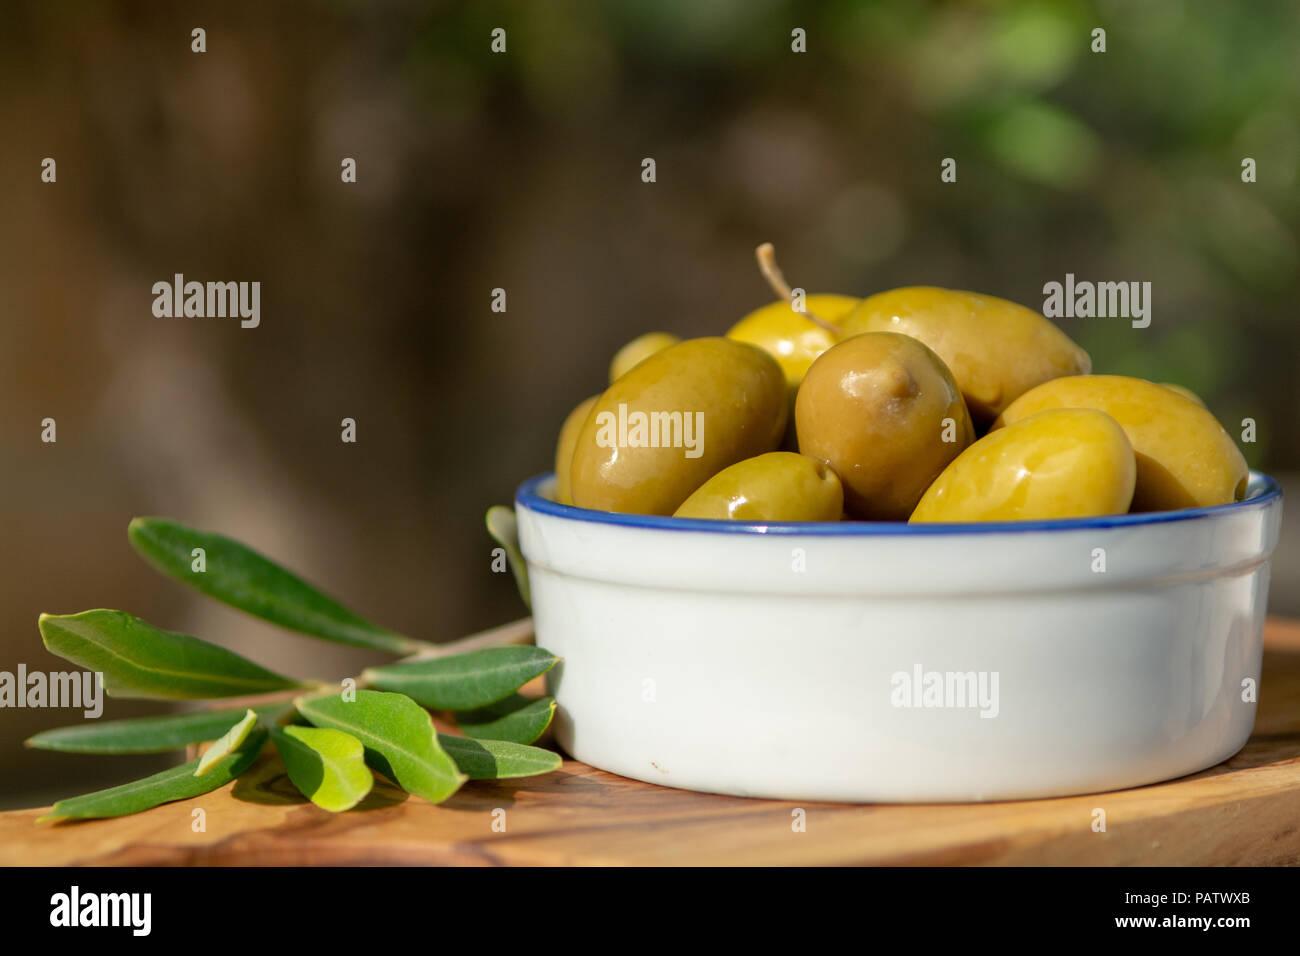 Fresh N Local Stock Photos & Fresh N Local Stock Images - Alamy